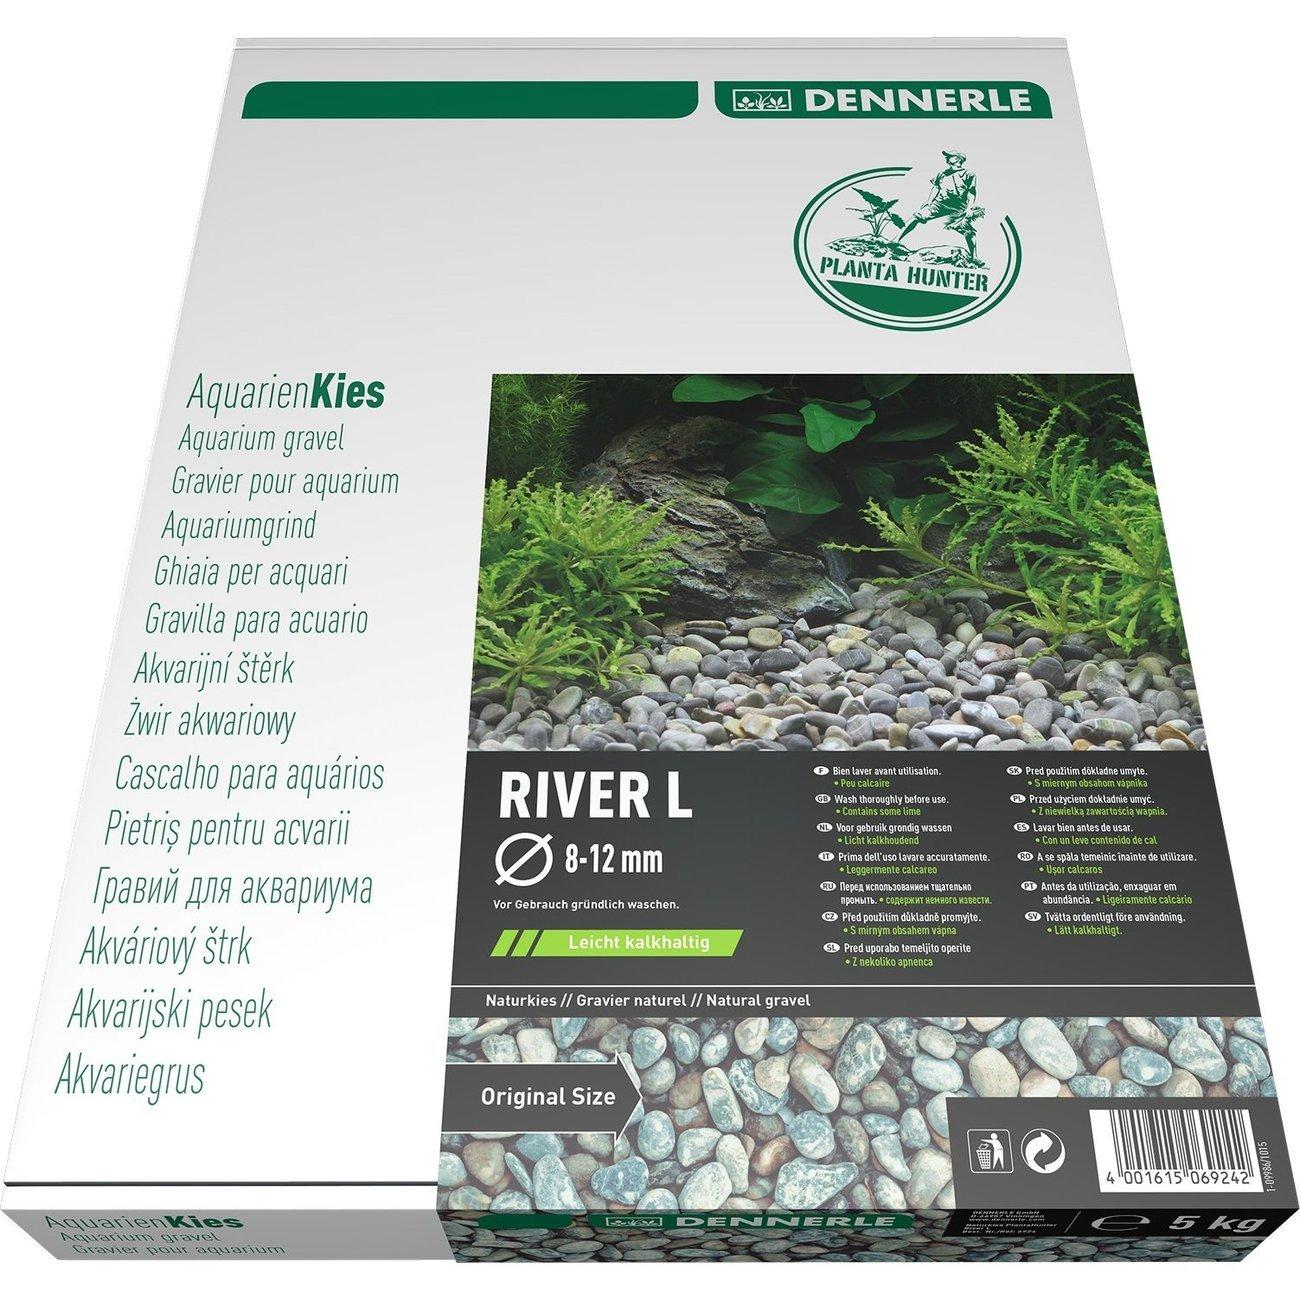 Dennerle Plantahunter-Kies River, Bild 5